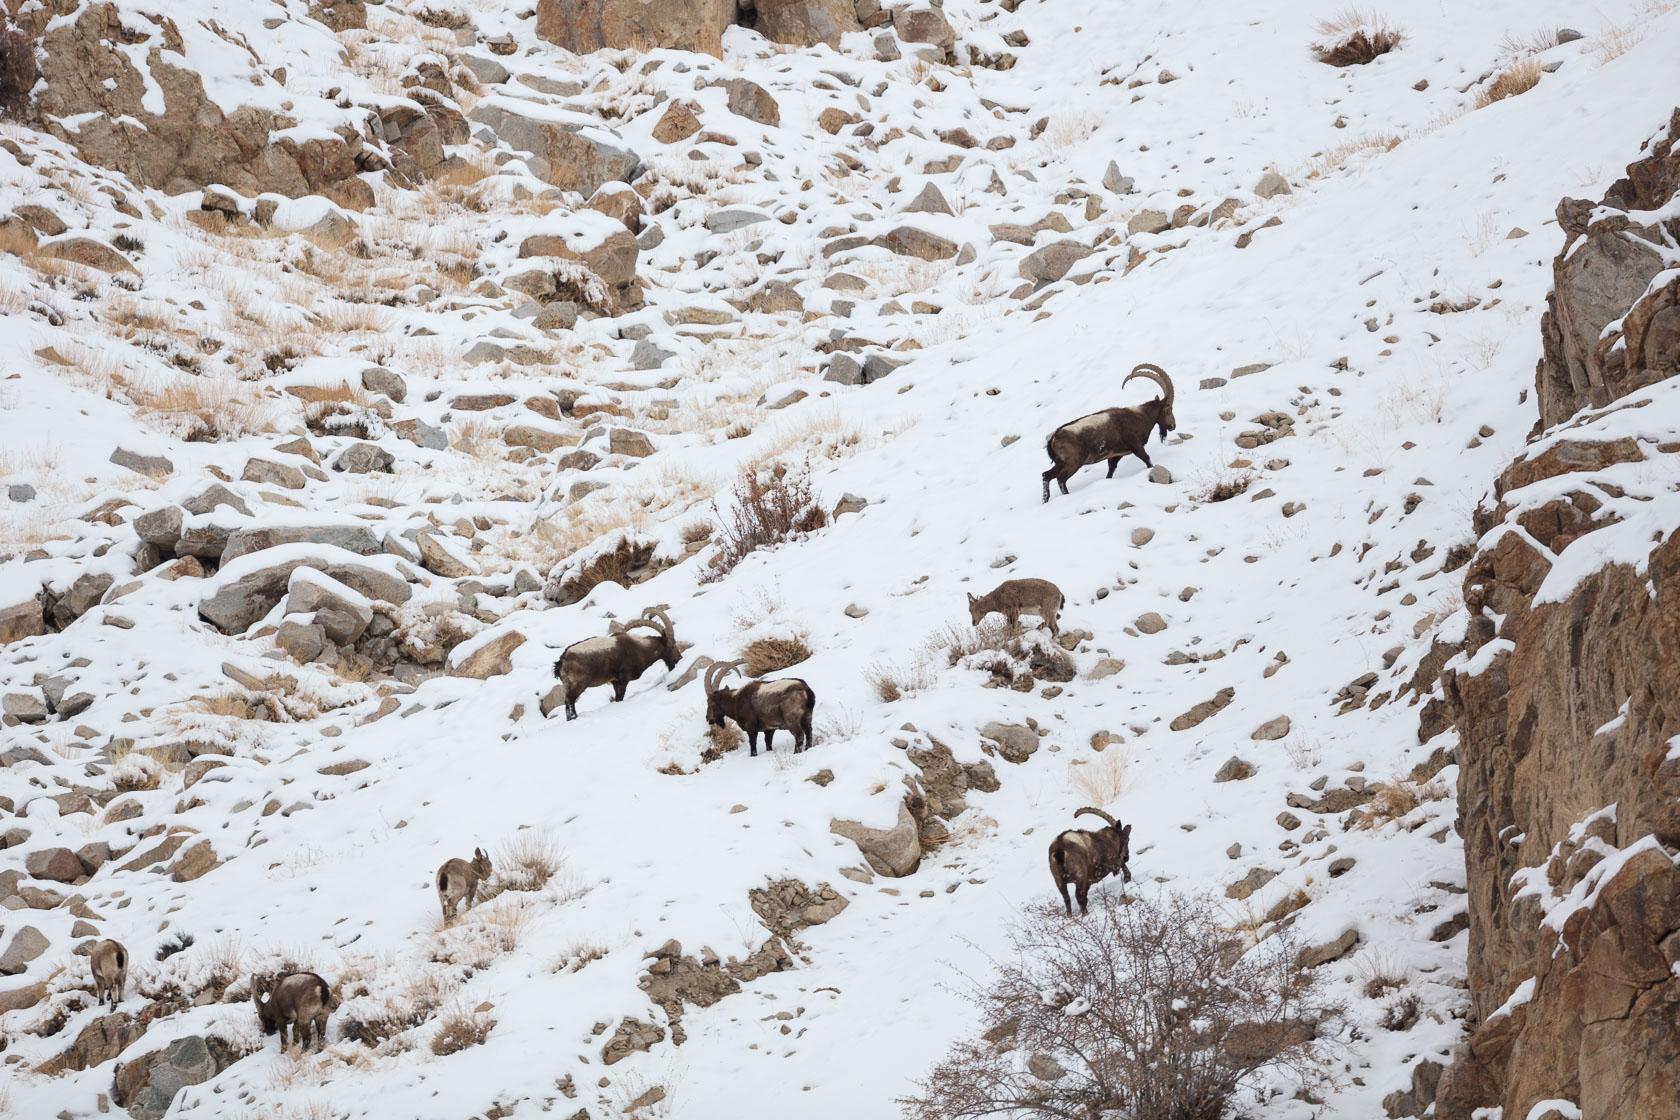 Bouquetin de l'Himalaya (Capra ibex sibirica) à Ulley, dans les montagnes du Ladakh